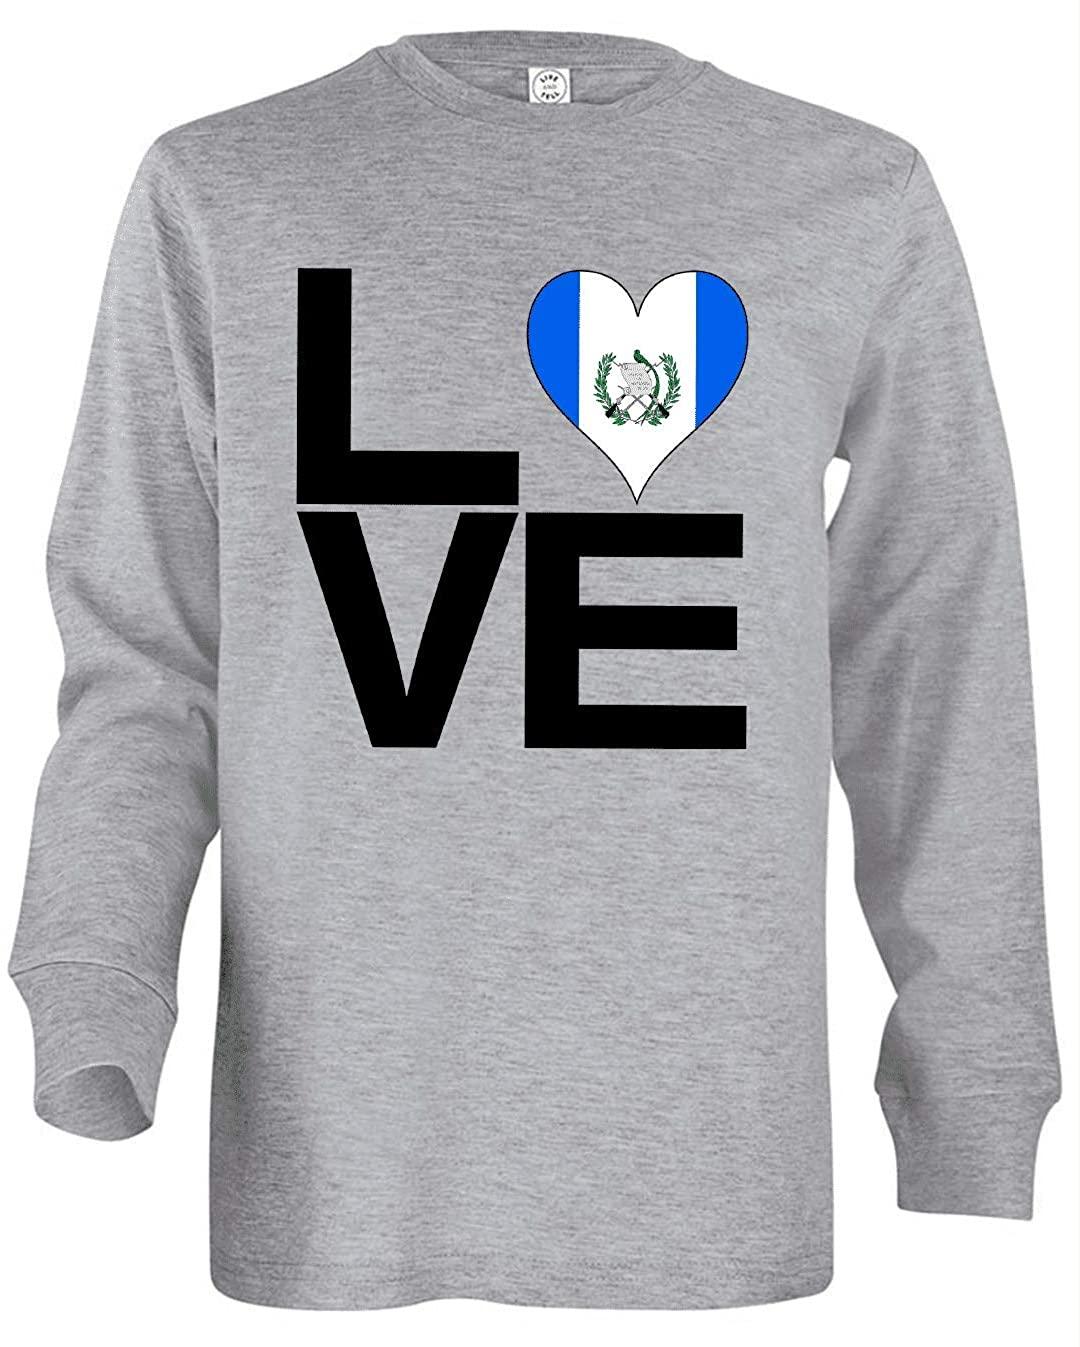 HARD EDGE DESIGN Girl's Youth Love Block Guatemala Heart Long Sleeve T-Shirt, Small, Heather Grey